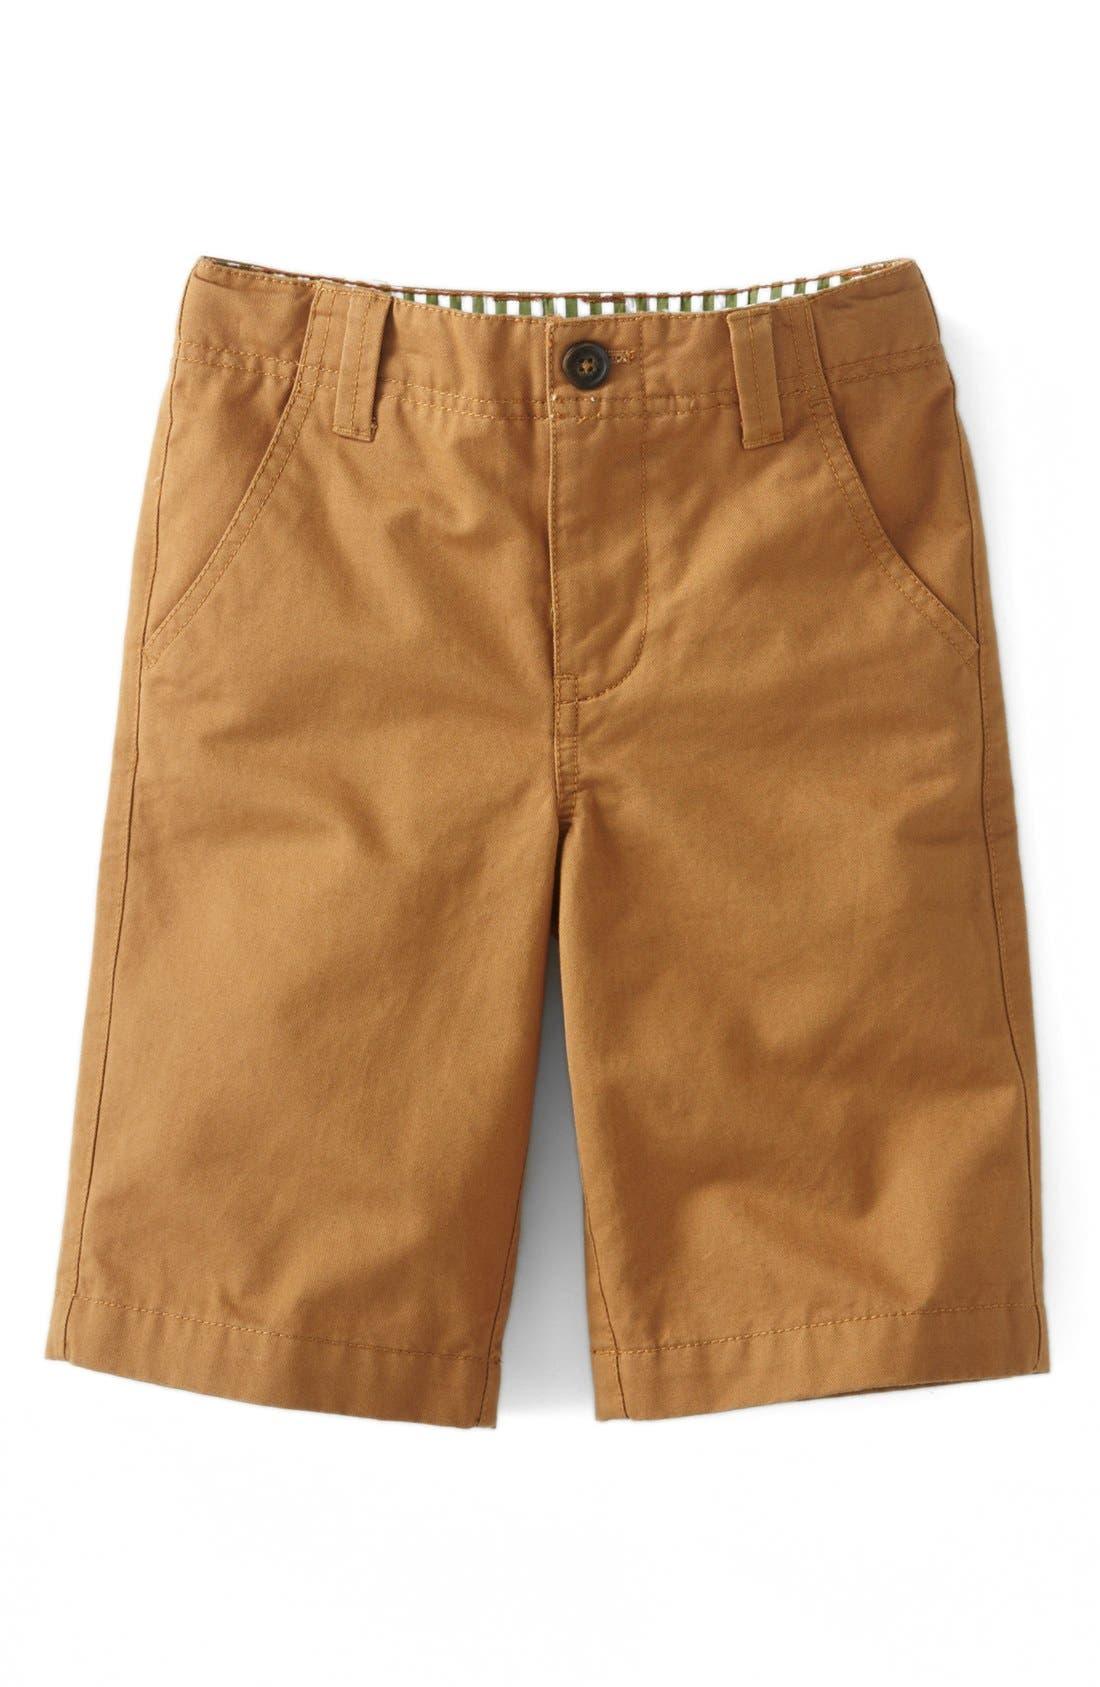 Main Image - Mini Boden Chino Shorts (Toddler Boys, Little Boys & Big Boys)